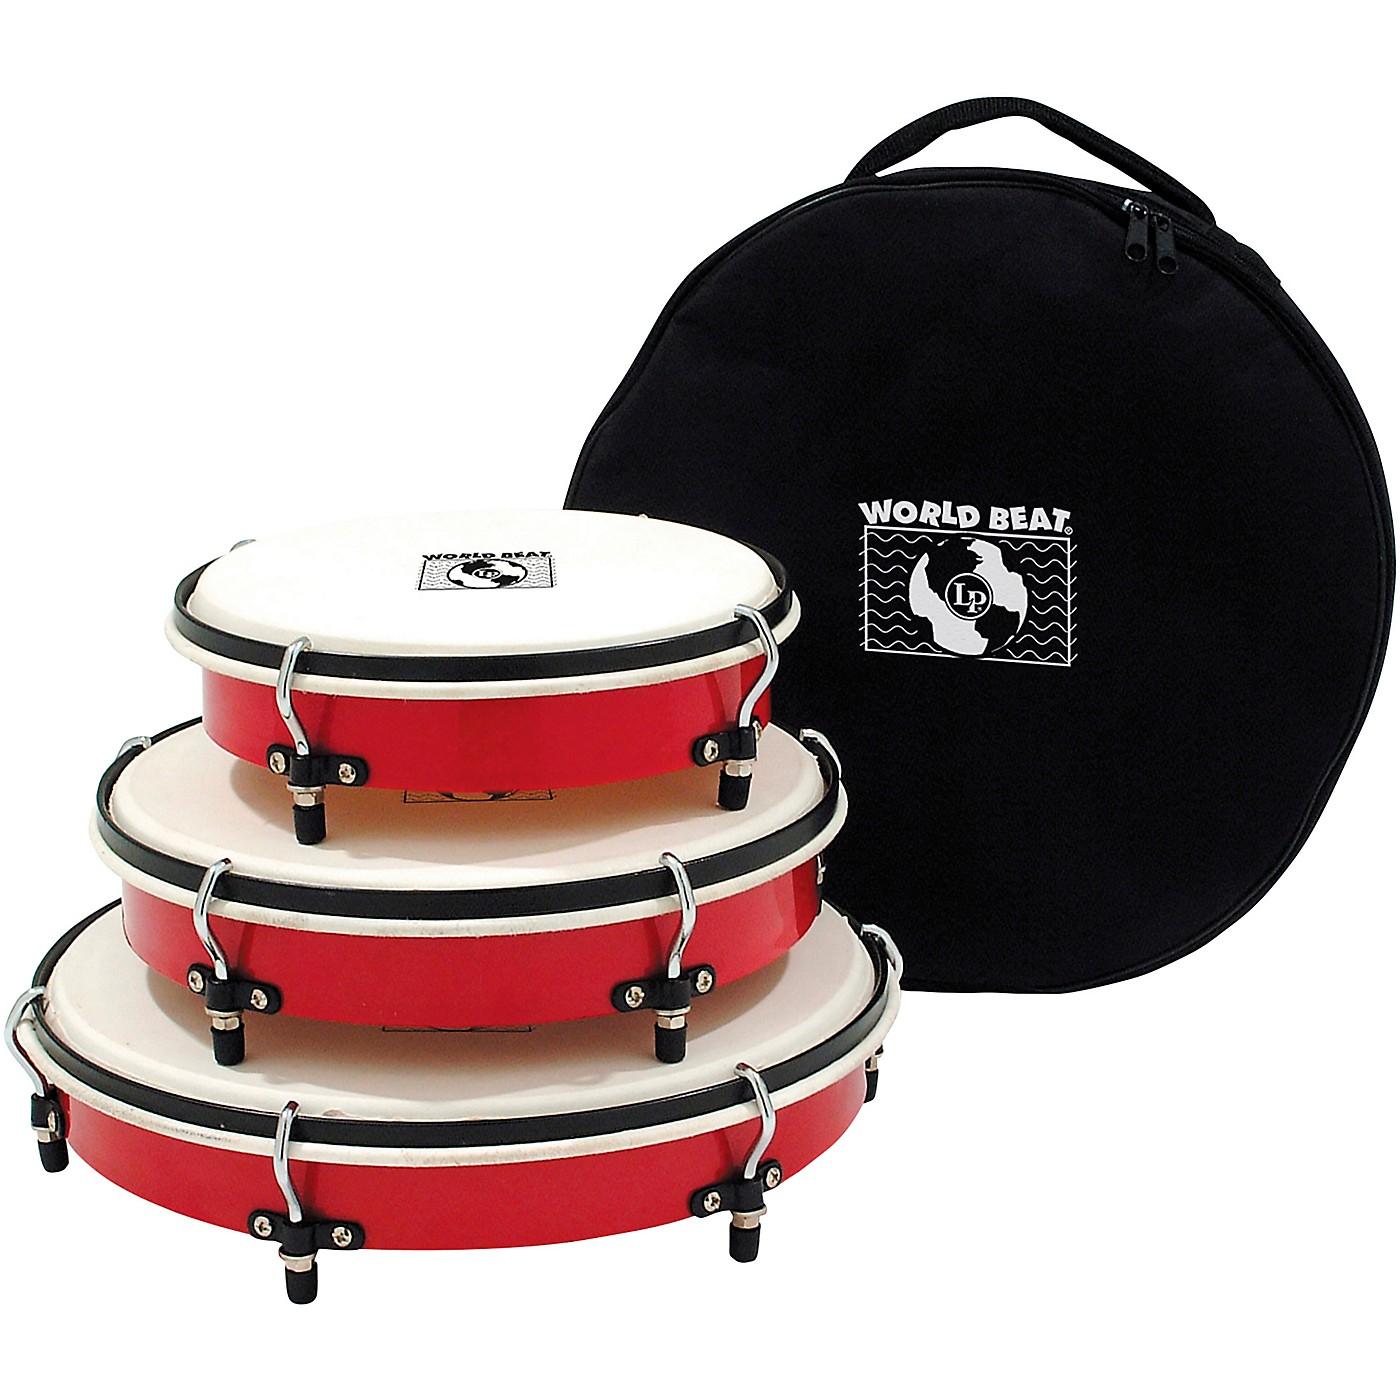 LP World Beat Plenera Drum Set with Bag thumbnail